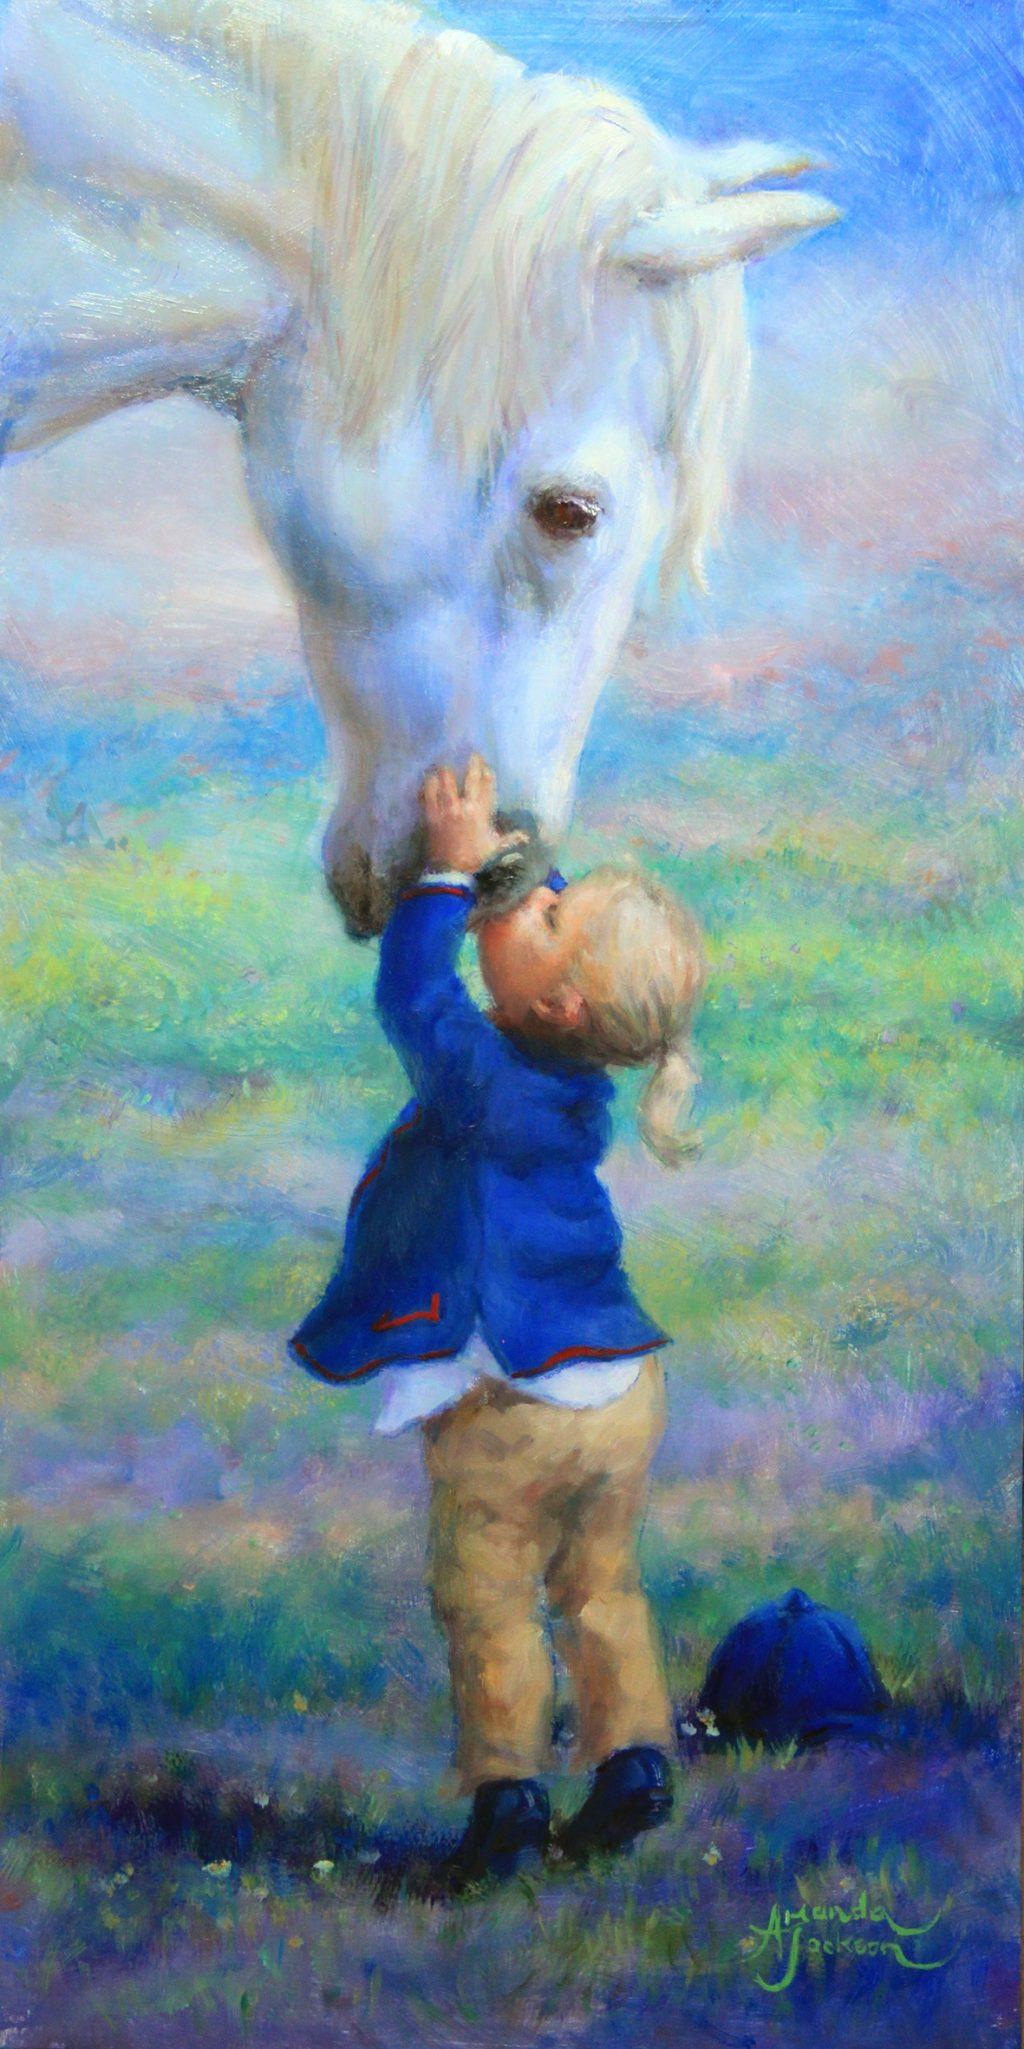 Amanda Jackson Paintings For Sale